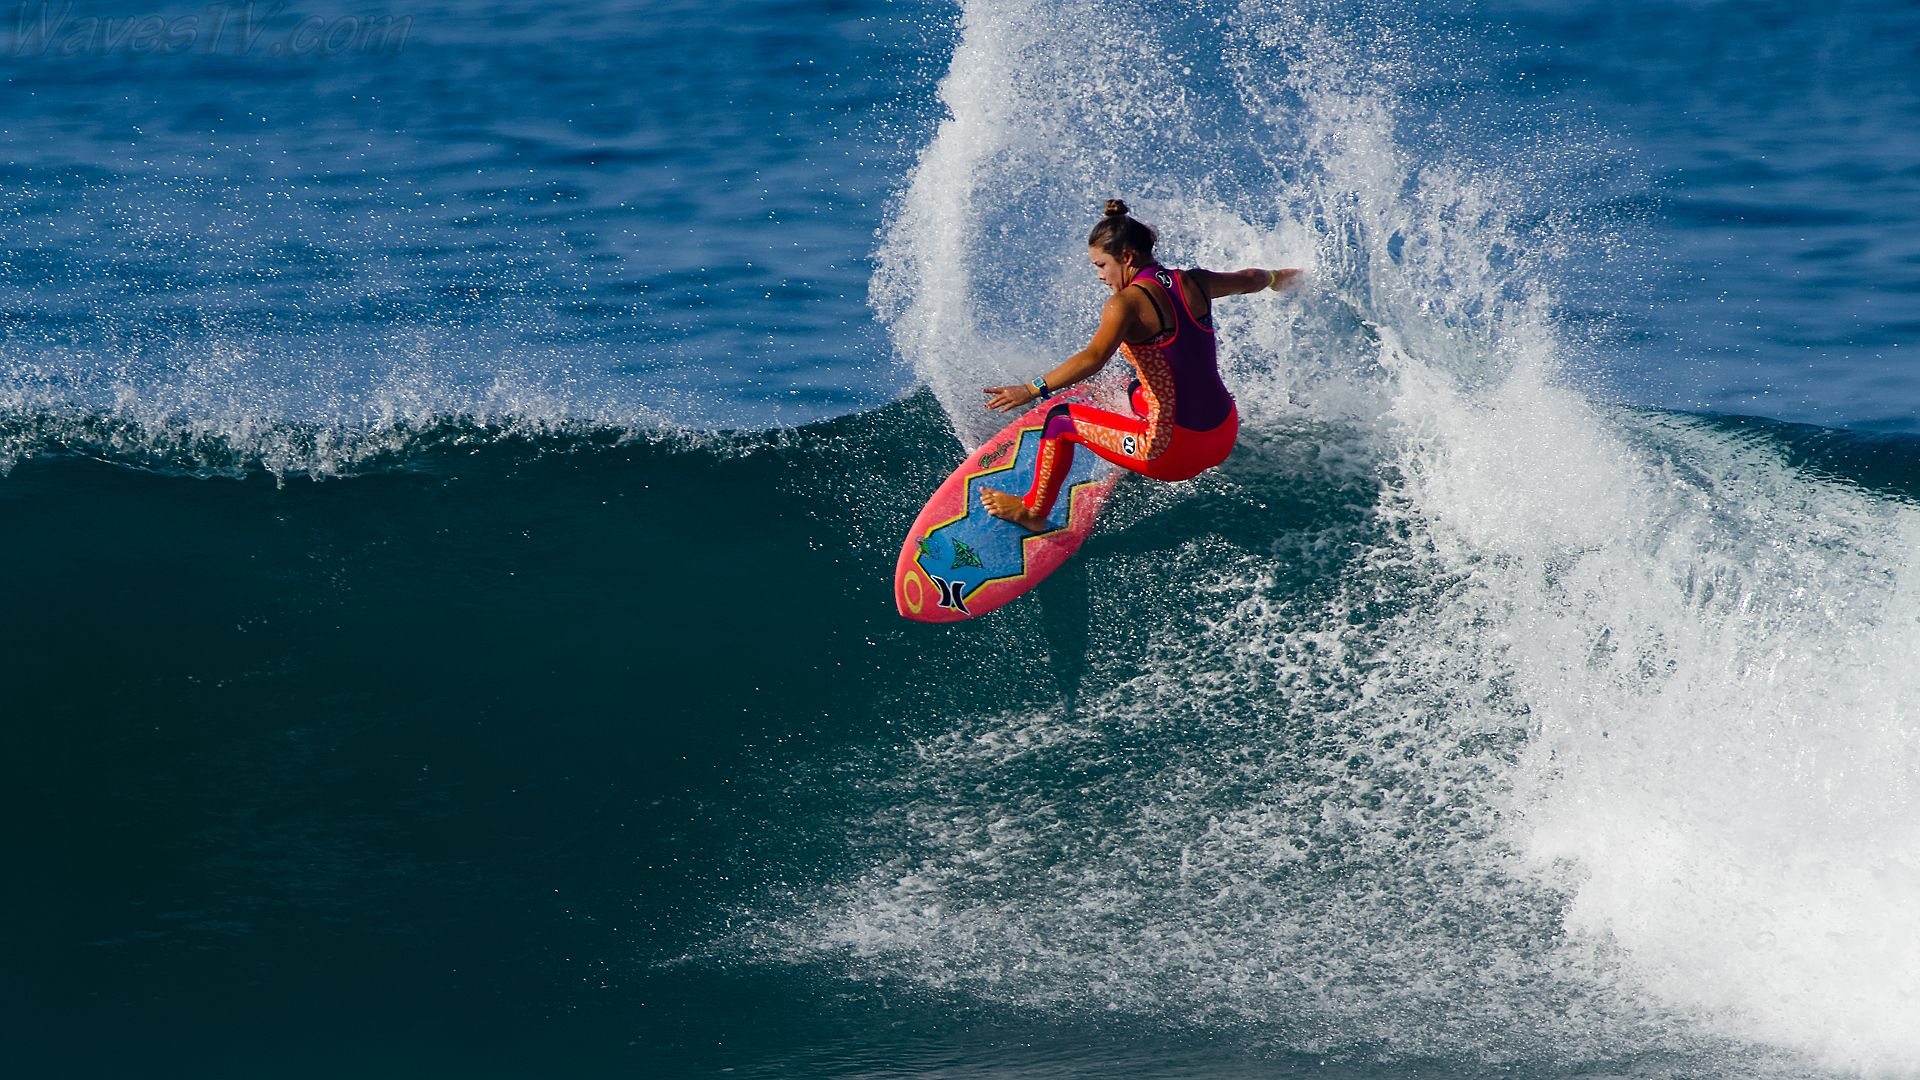 Surfer Girl image